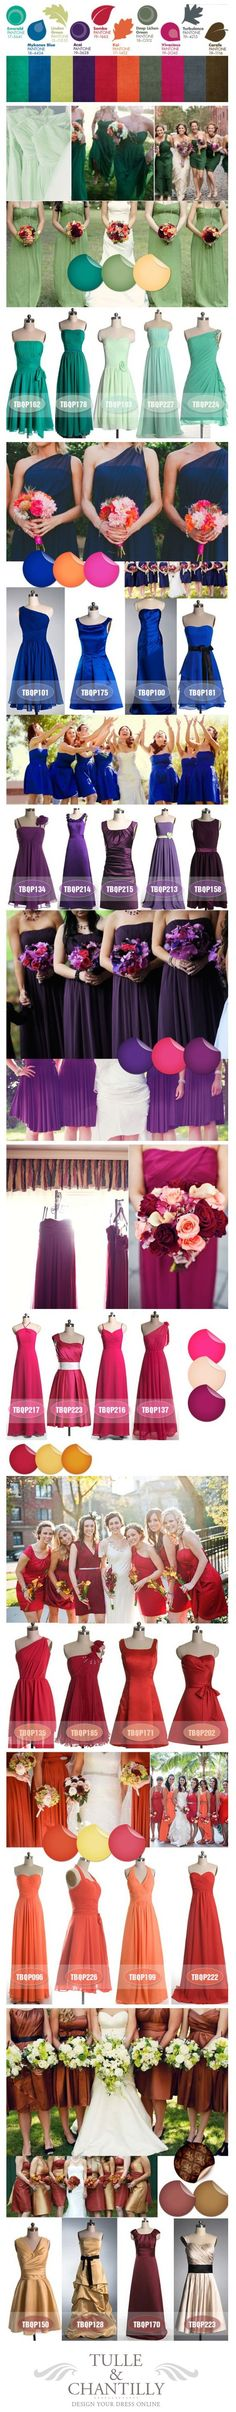 Purple, blue, green, red, orange bridesmaid dresses color ideas for fall wedding.